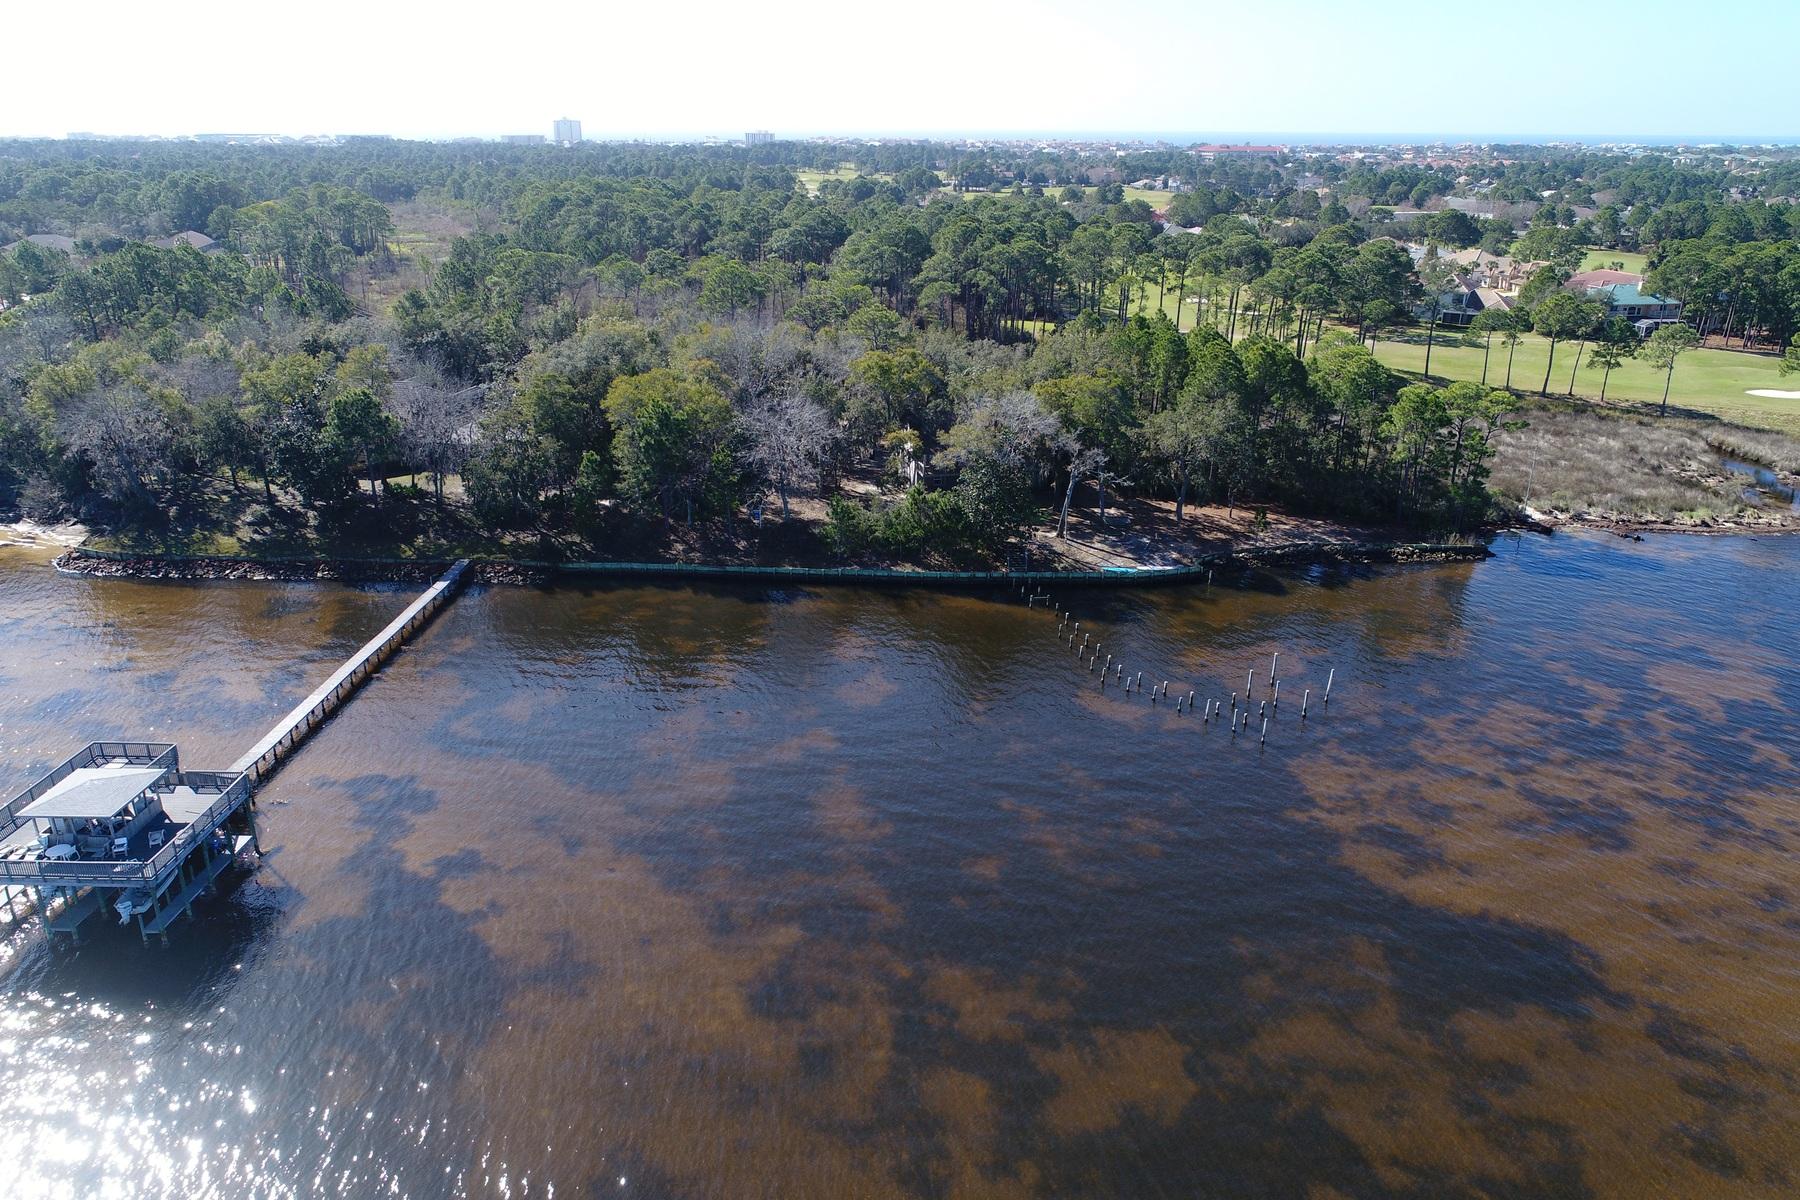 Terreno per Vendita alle ore EXCEPTIONAL HOMESITE LOCATED ON 100 FEET OF BAYFRONT Lot 26 Walton Way Miramar Beach, Florida, 32550 Stati Uniti